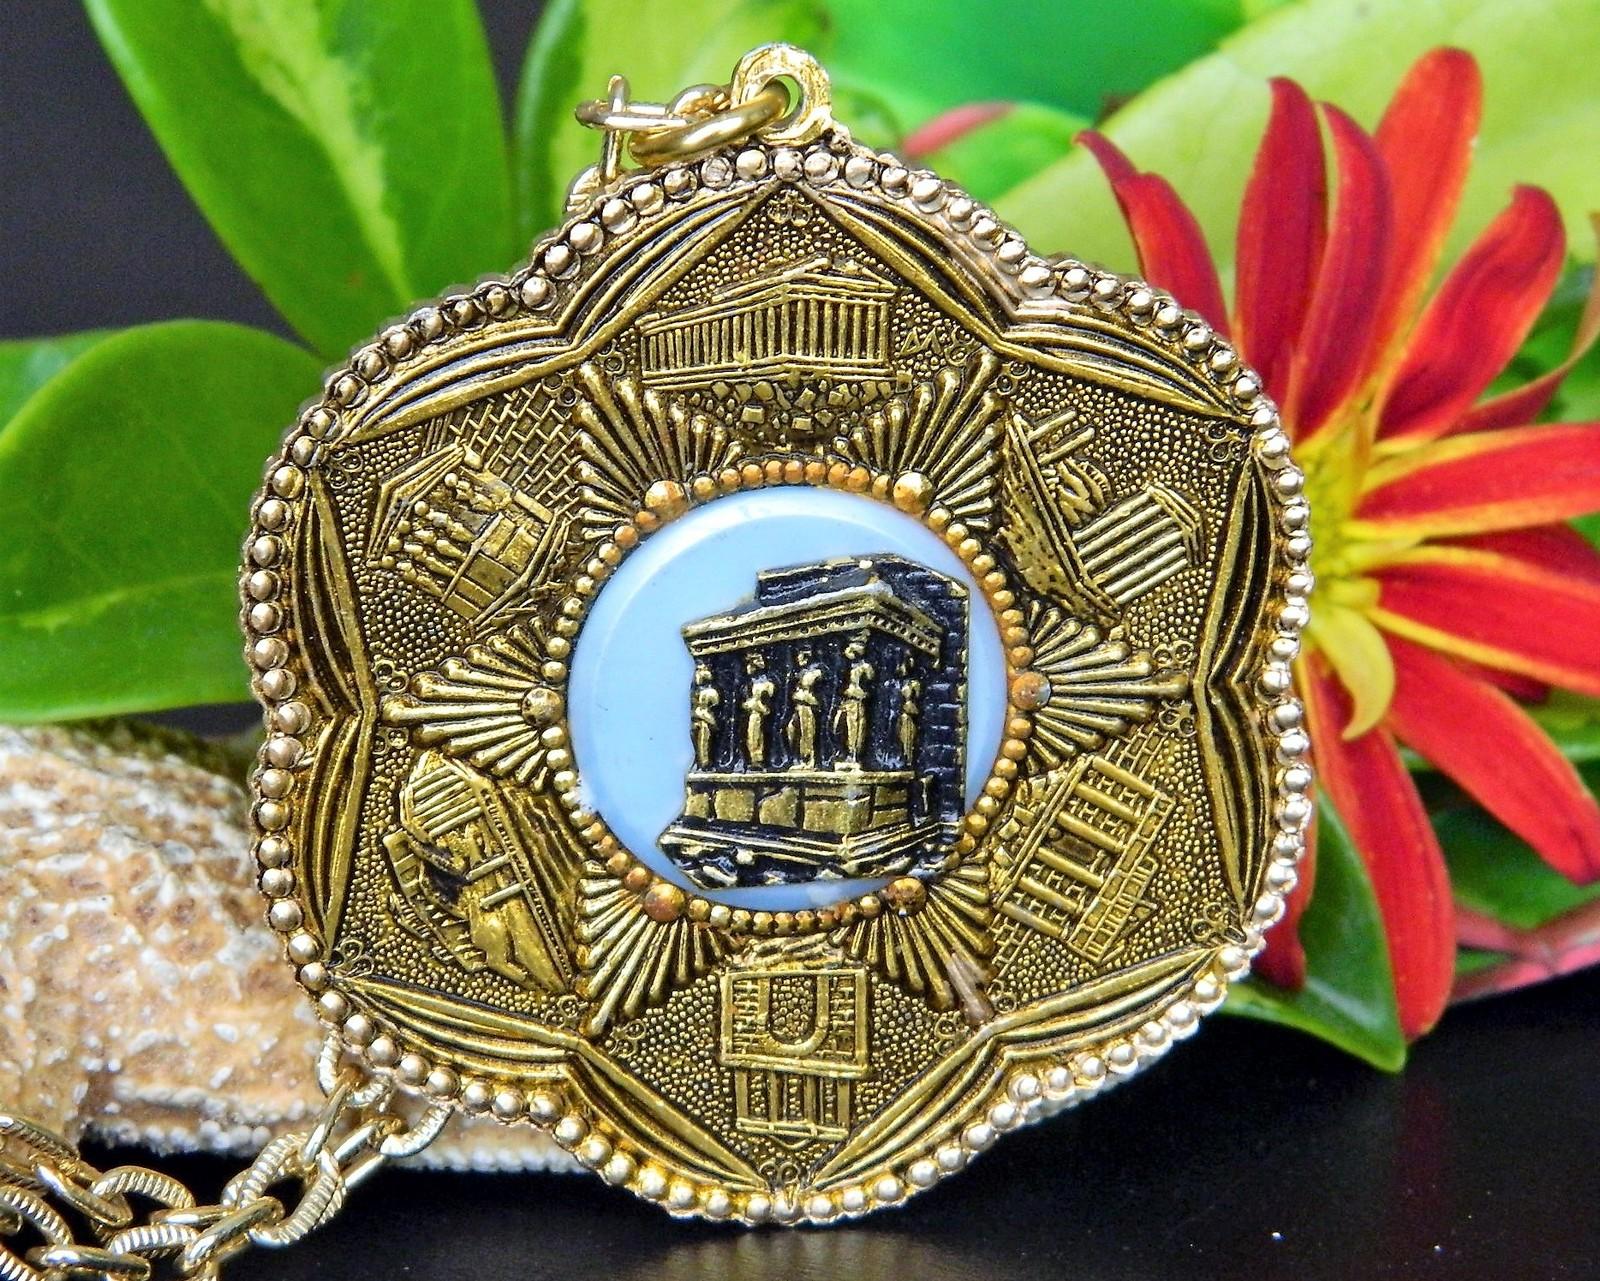 Vintage Athens Parthenon Acropolis Greek Greece Souvenir Necklace